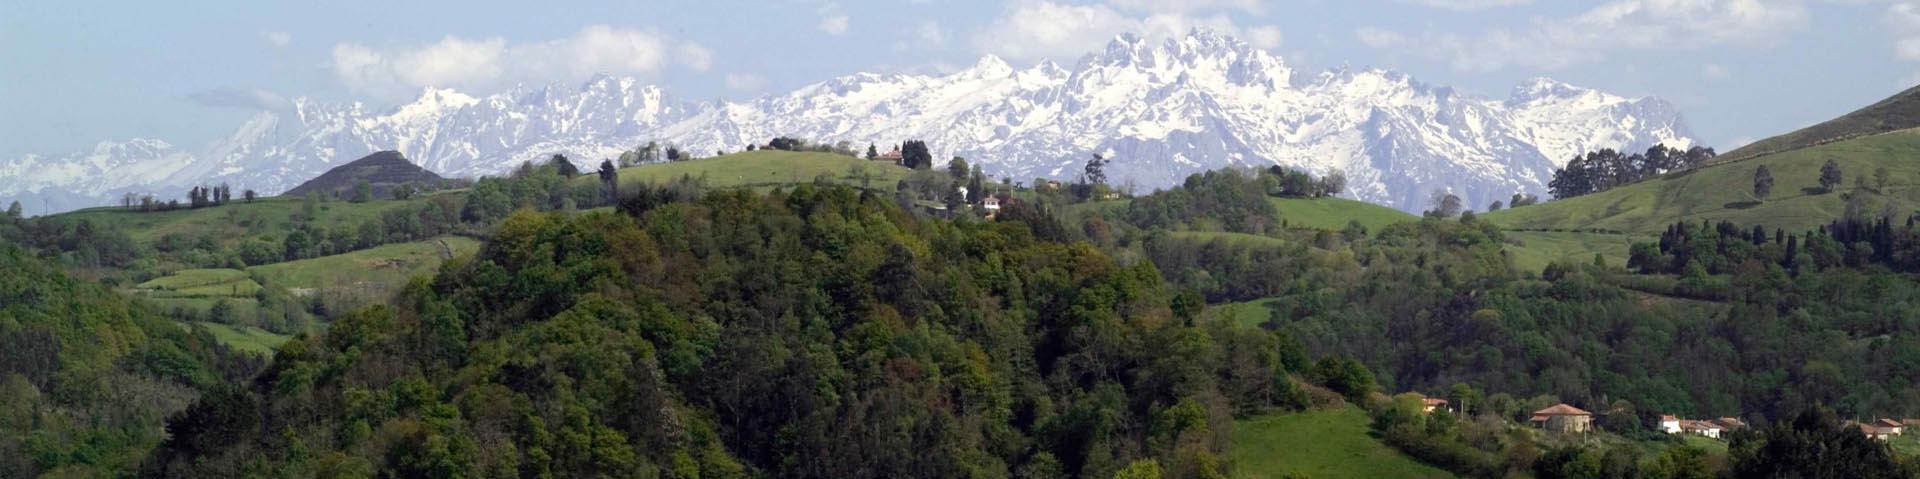 La comarca de la sidra con Picos de Europa al fondo